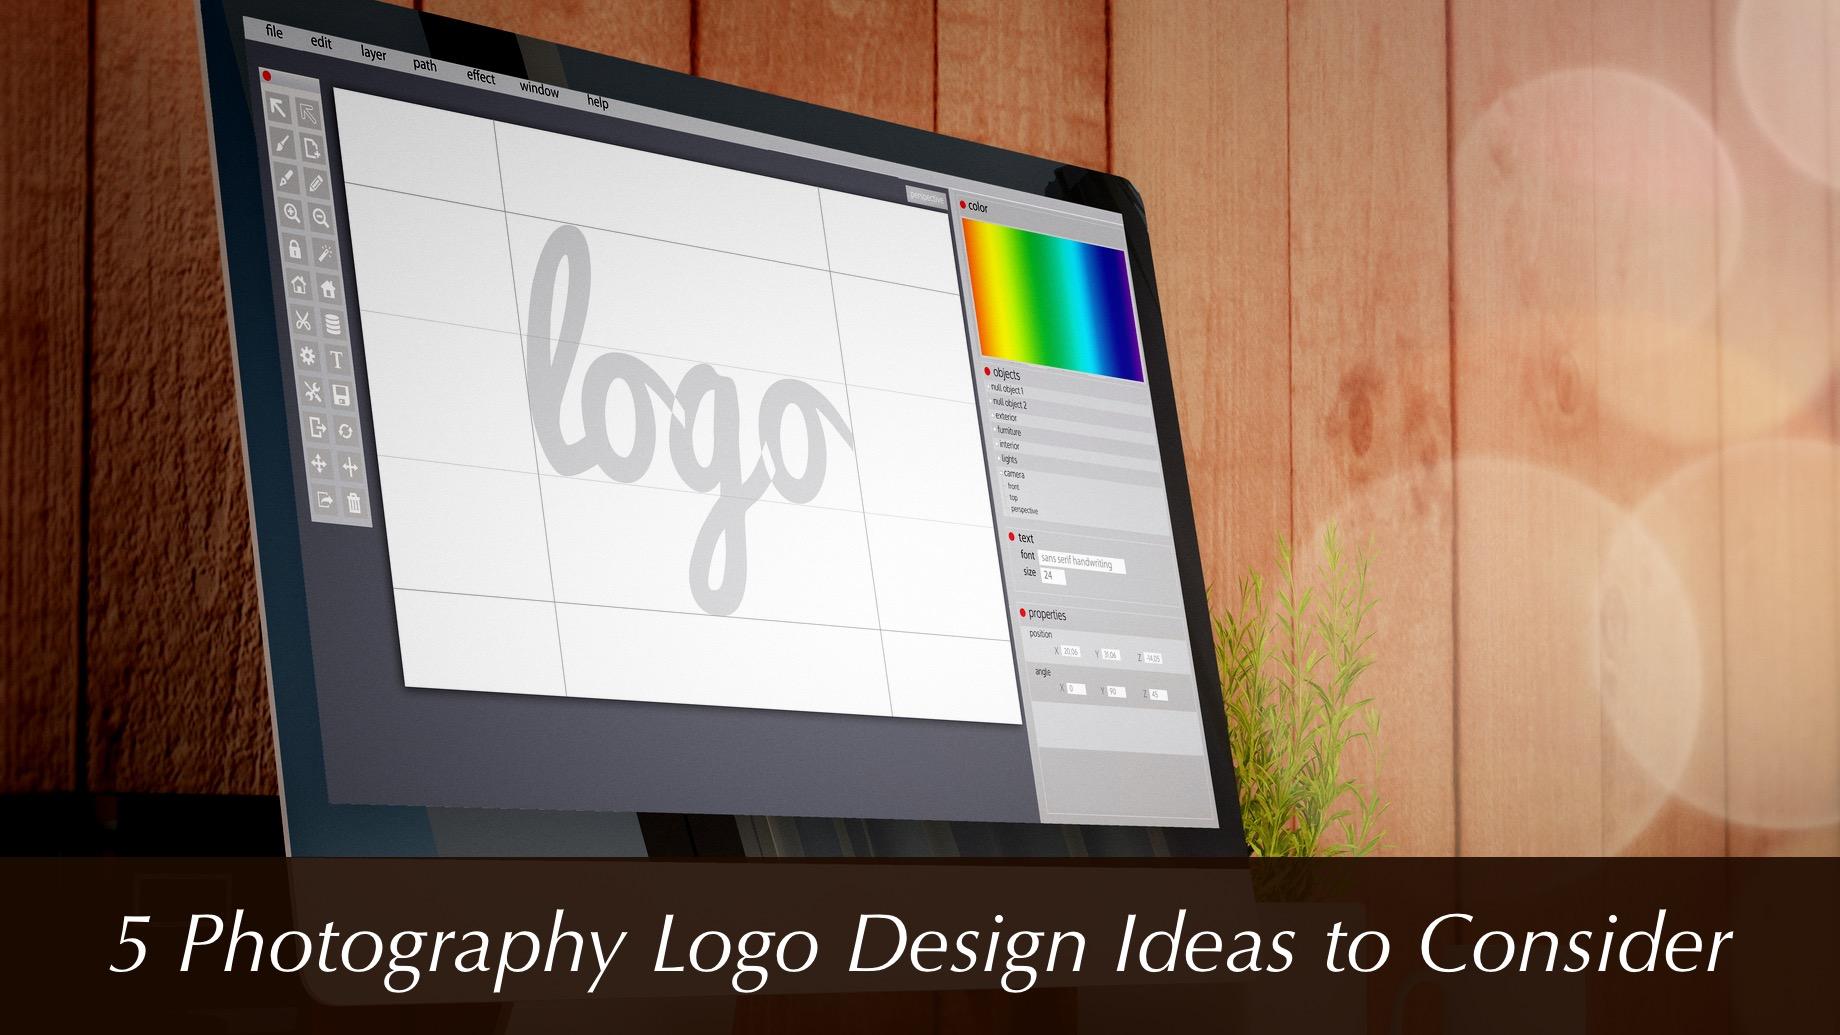 5 Photography Logo Design Ideas to Consider